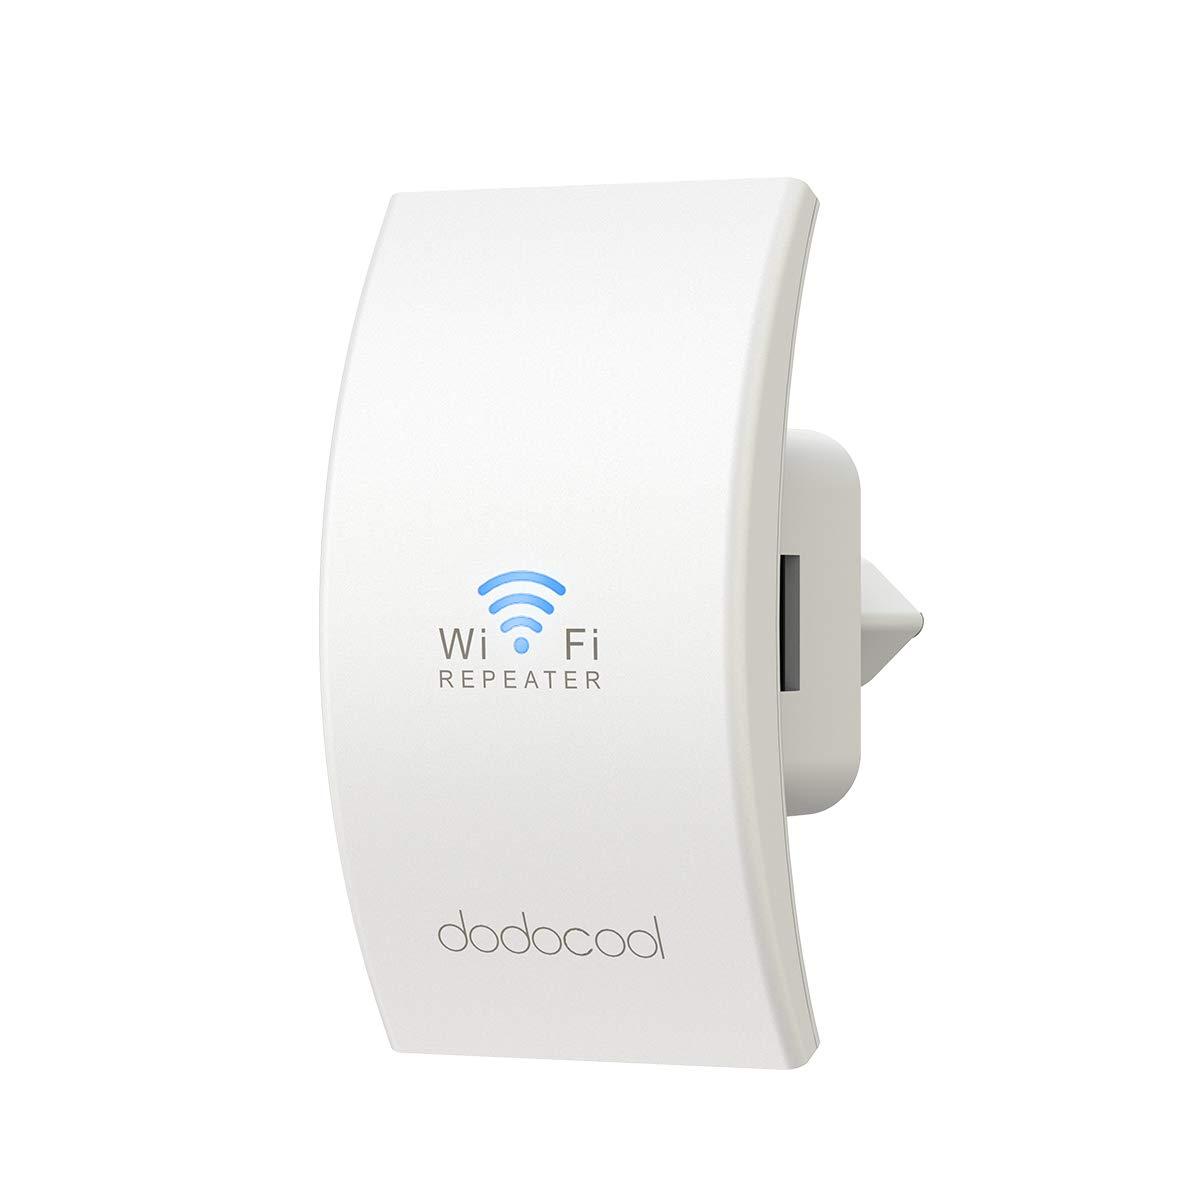 Ripetitore Wi-Fi 300 Mbps dodocool